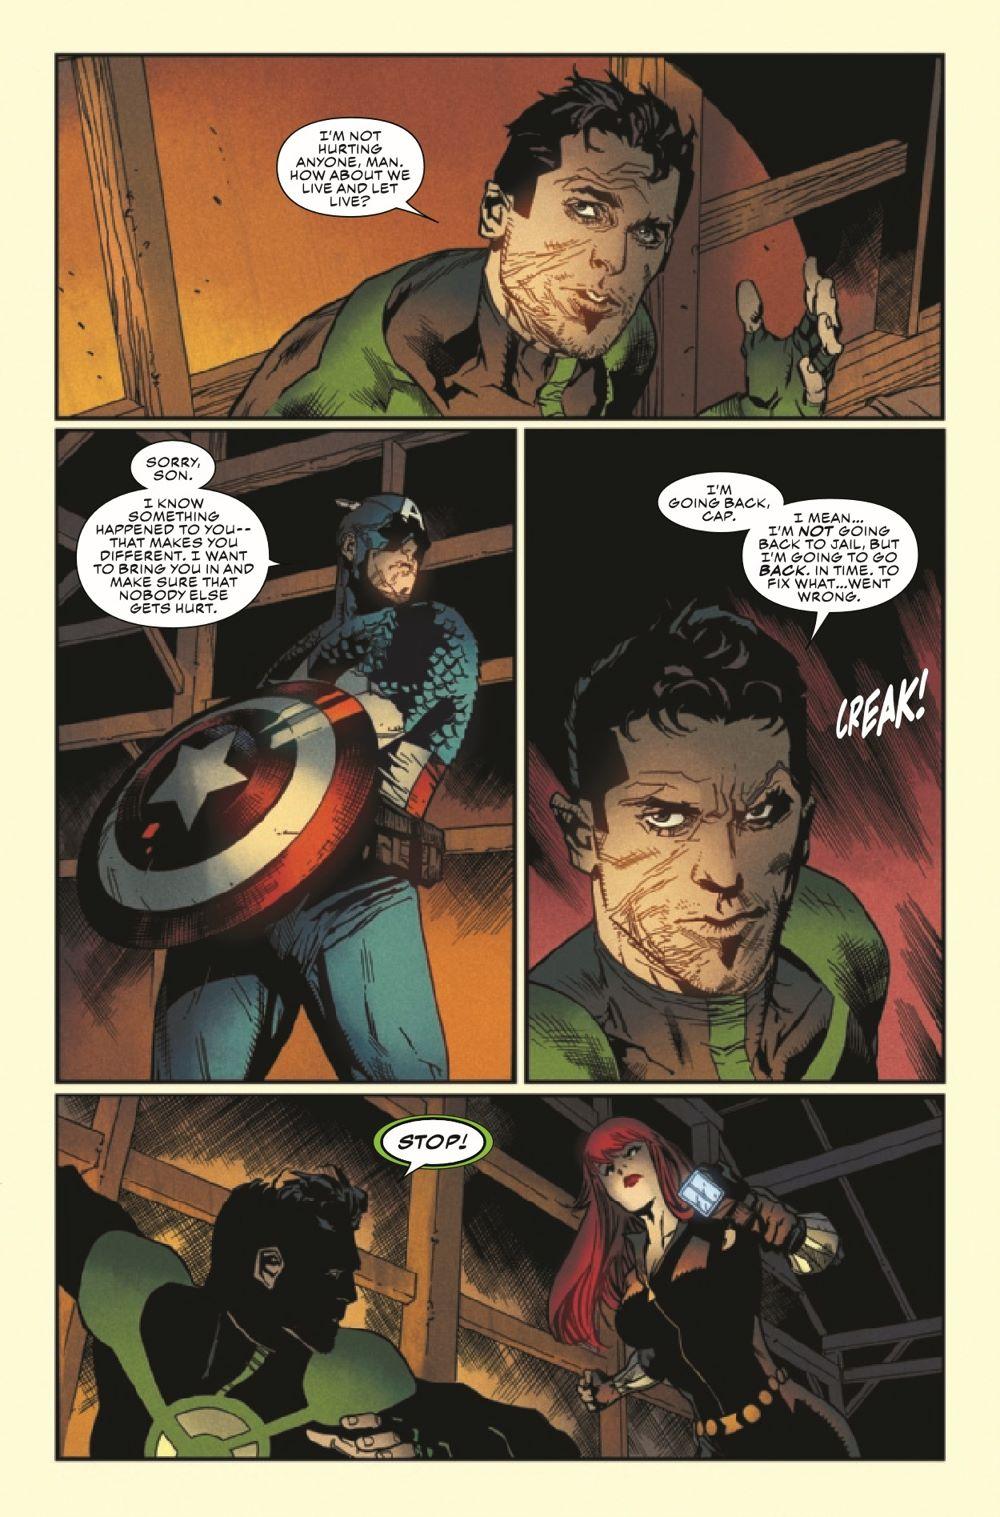 CAPAANN2021001_Preview-6 ComicList Previews: CAPTAIN AMERICA ANNUAL #1